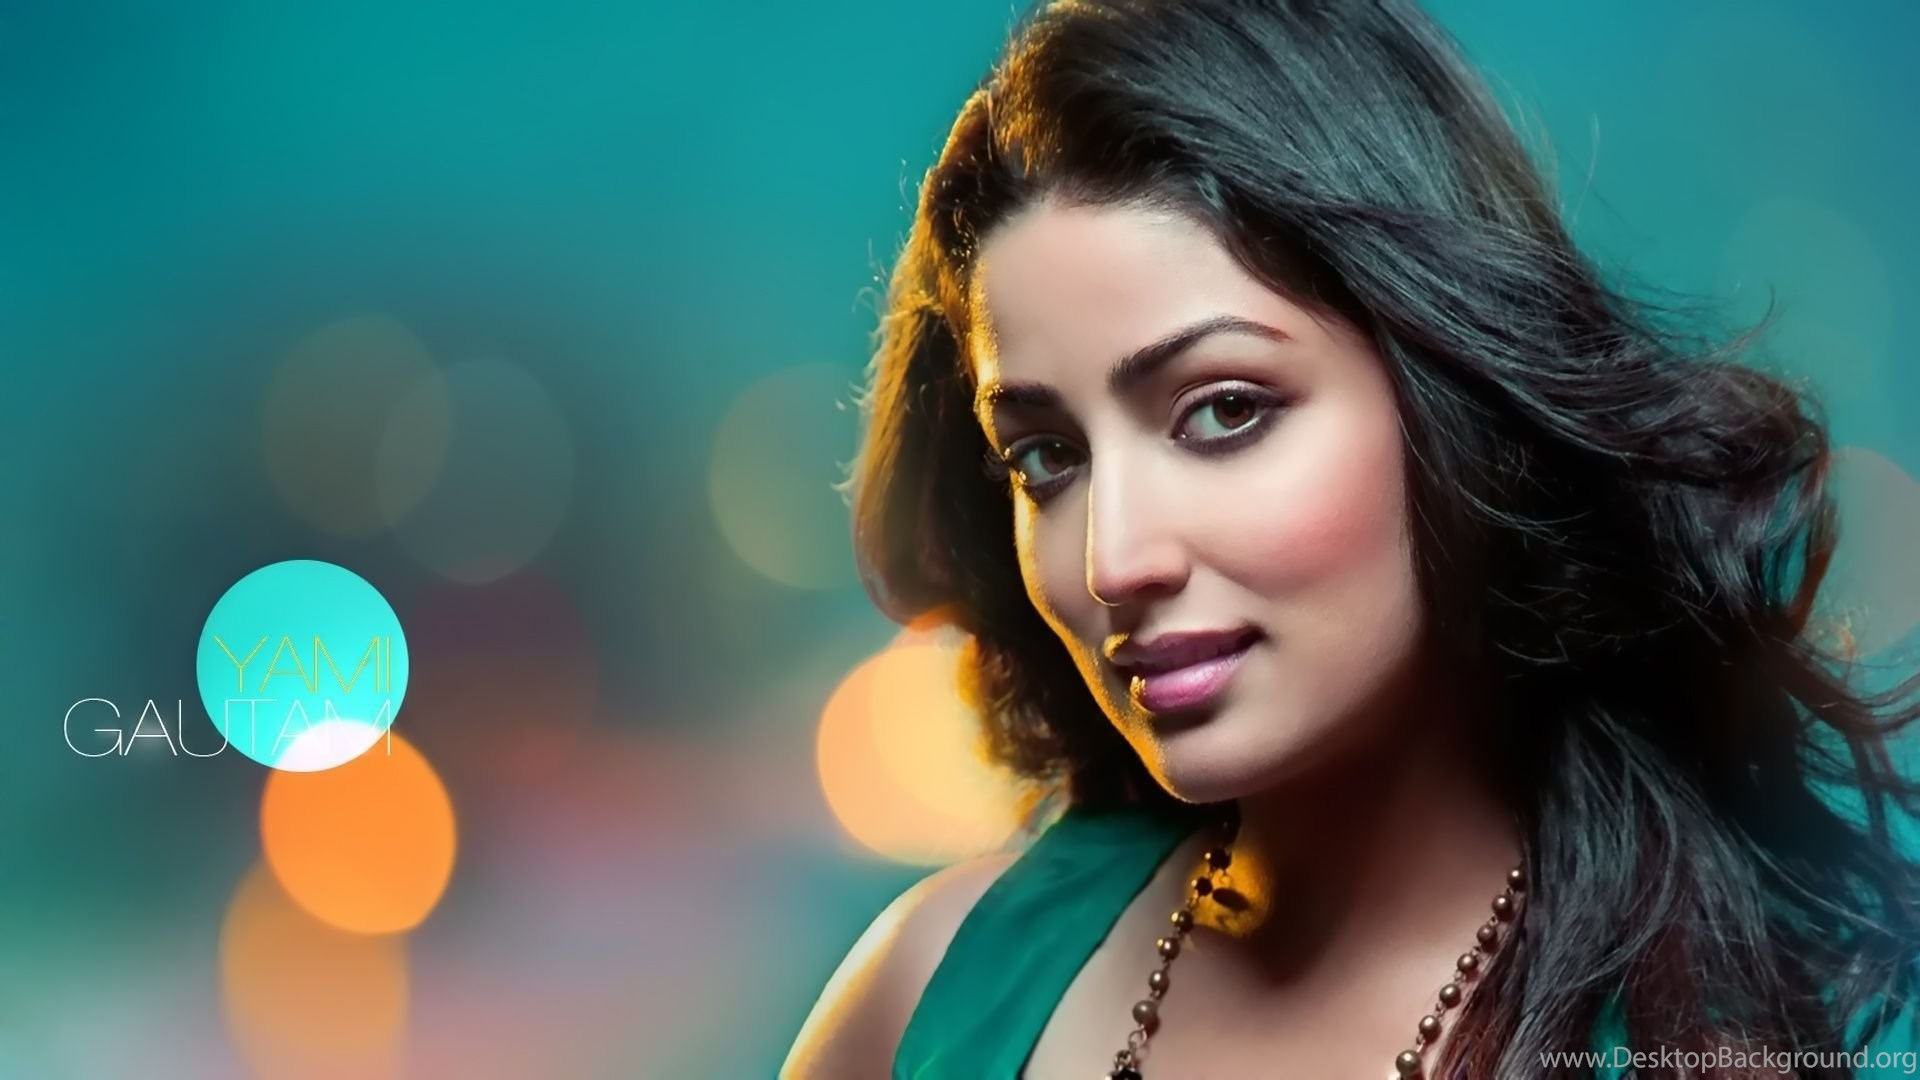 indian beautiful girls hd wallpapers free download desktop background